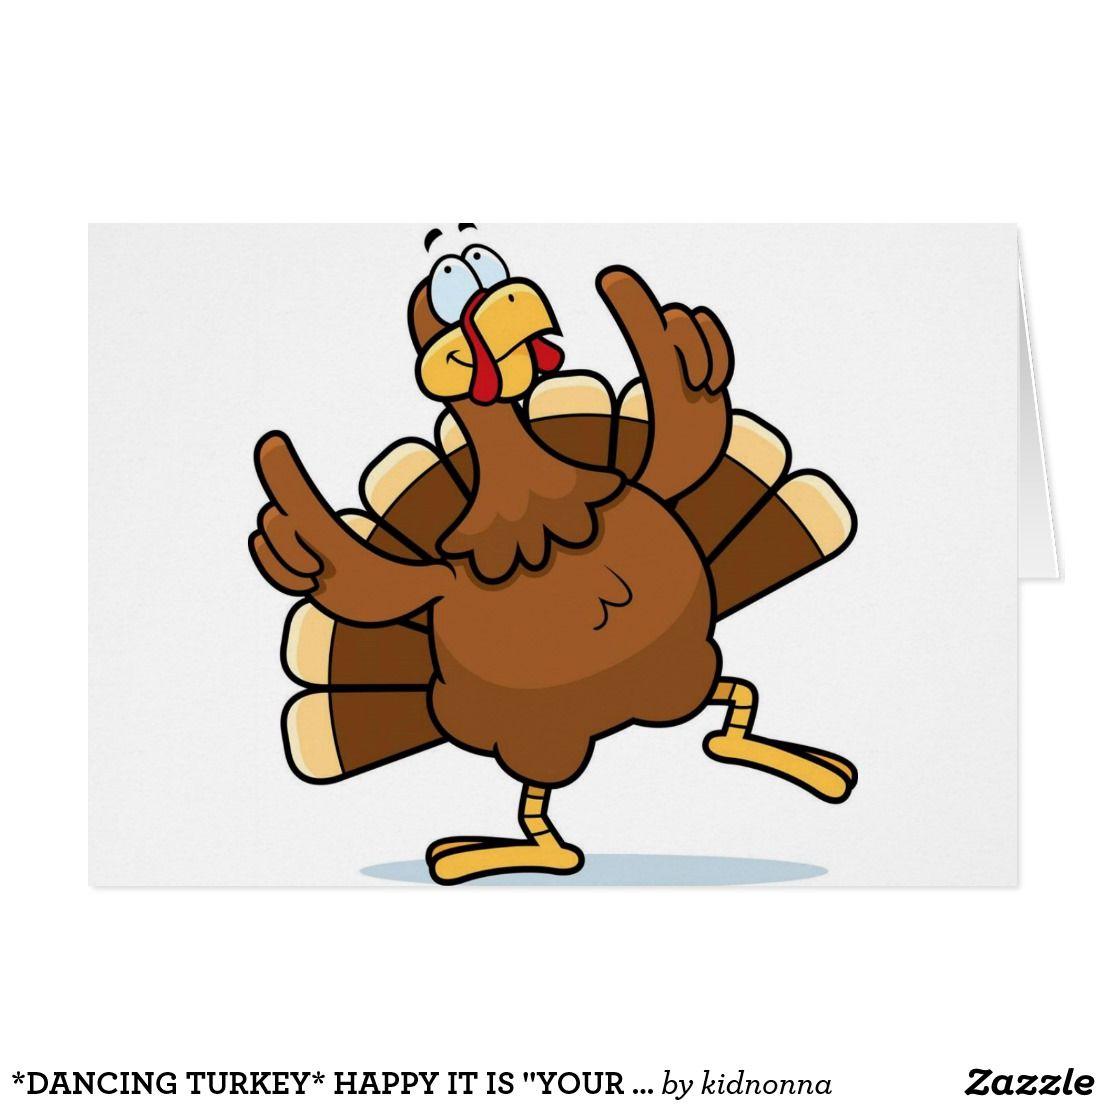 dancing turkey happy it is your birthday card birthdays rh pinterest com dancing turkey clipart free dancing turkey clipart free